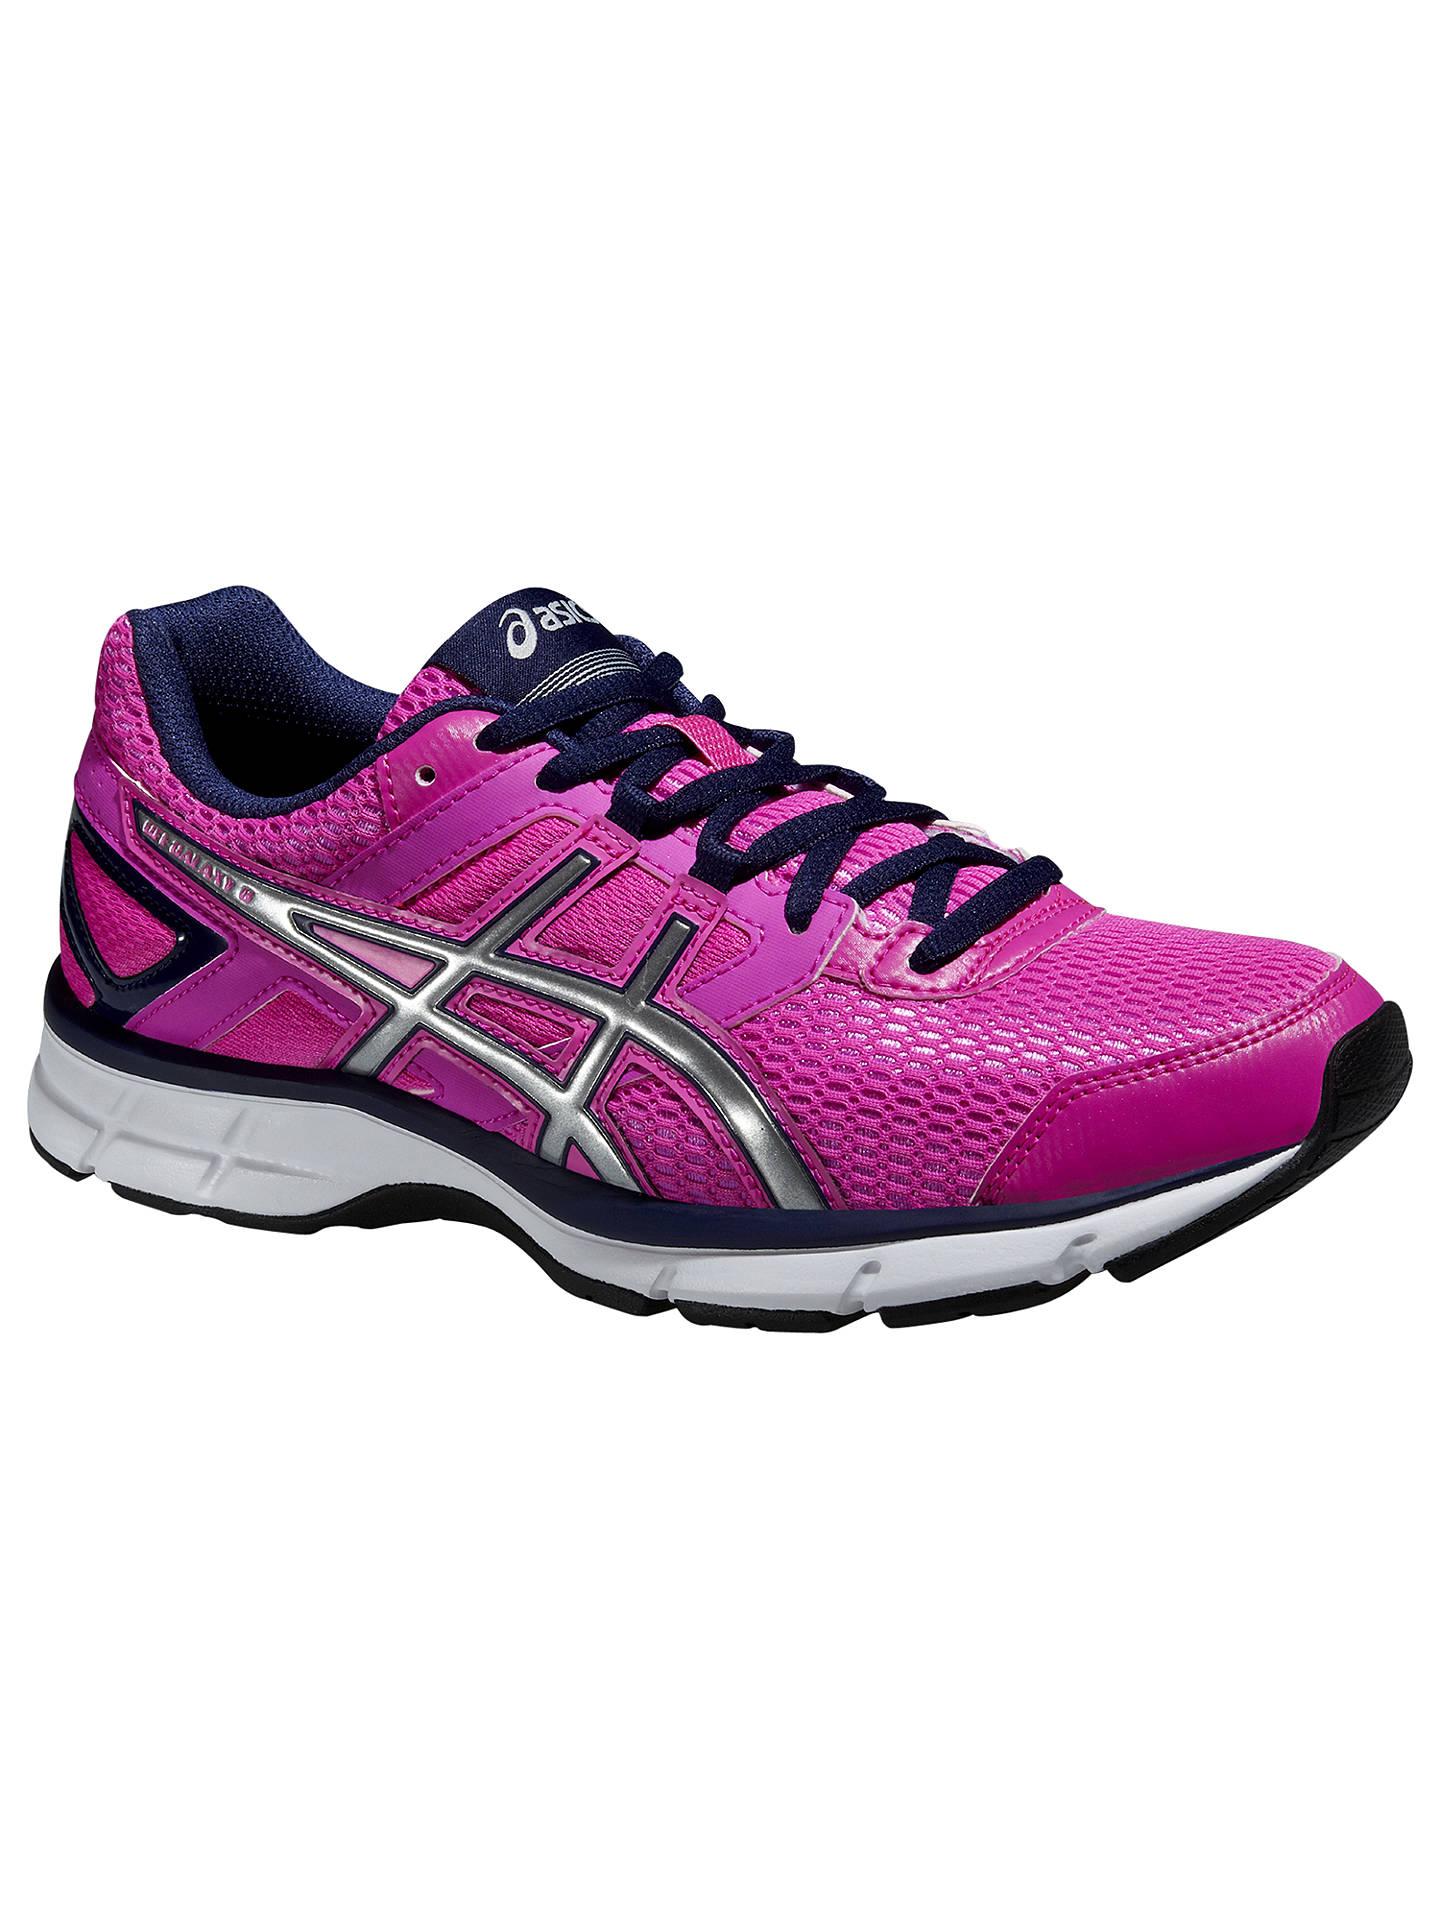 Asics Gel-Galaxy 8 Women's Cushioning Running Shoes at